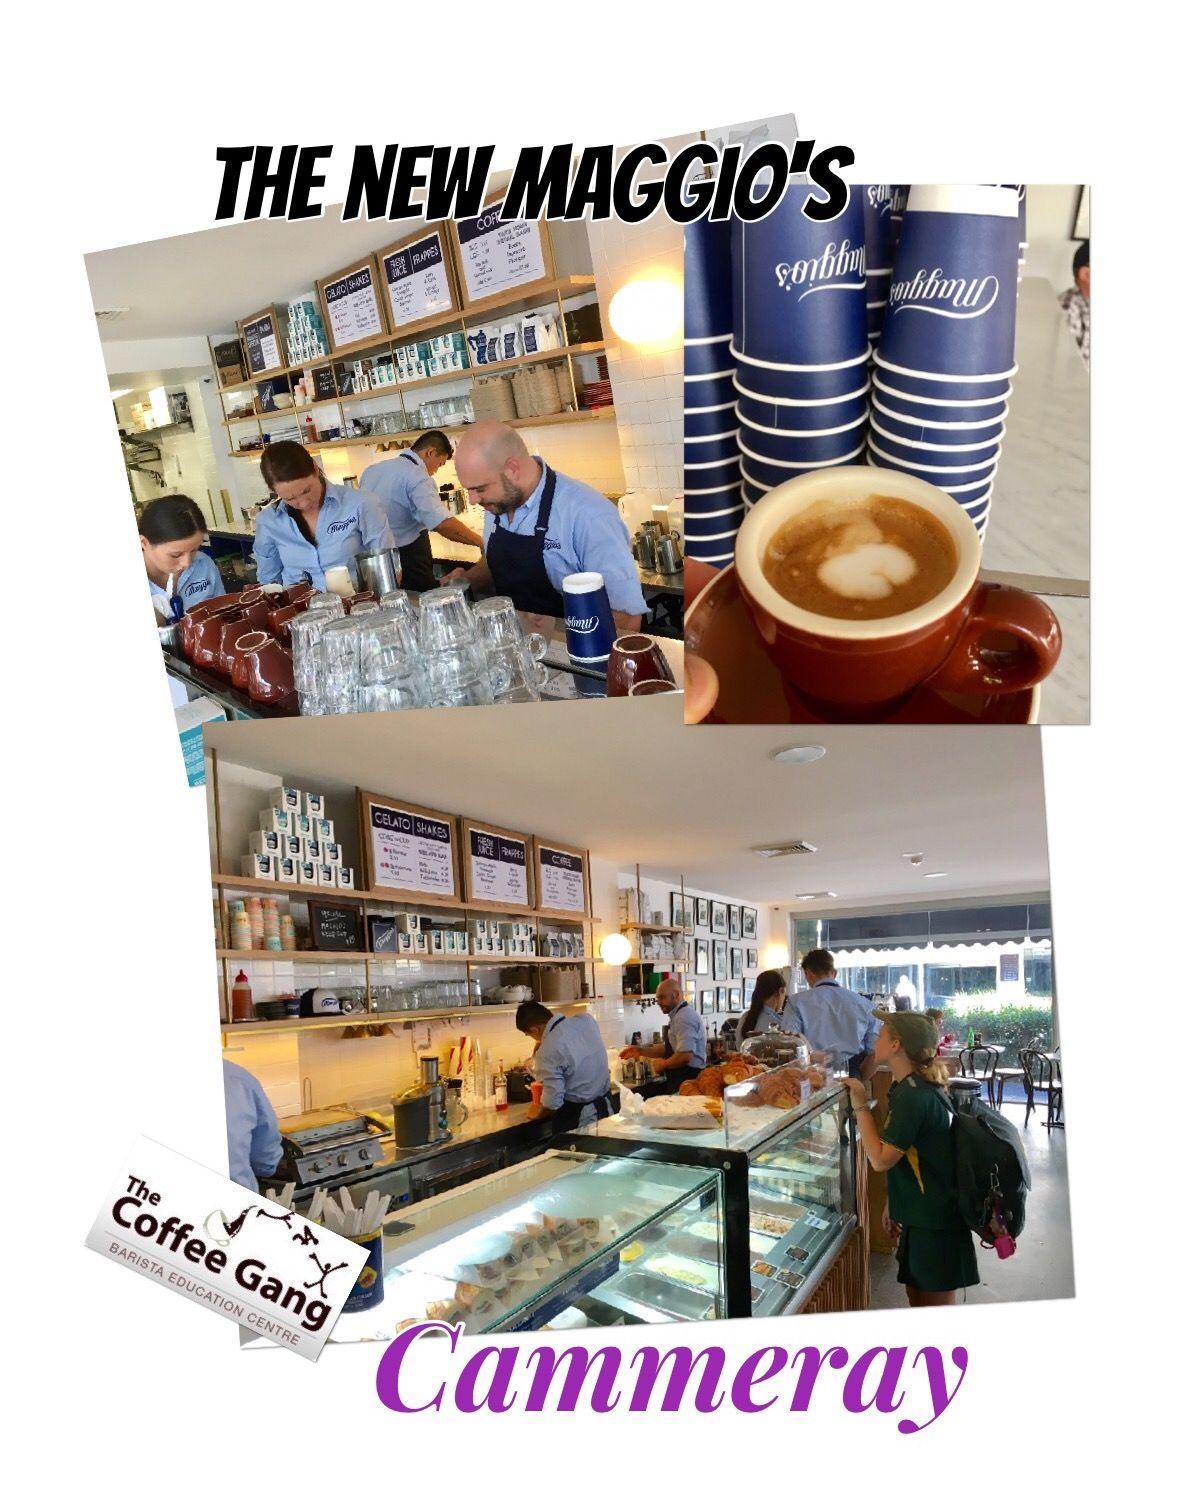 Maggio s - Cammeray - Sydney - coffee Grand Cru 8 10  thecoffeegang   maggioscafe  grandcru  trubarista  coffee  coffeelover  coffeeworld   cafelife ... 025692a2954